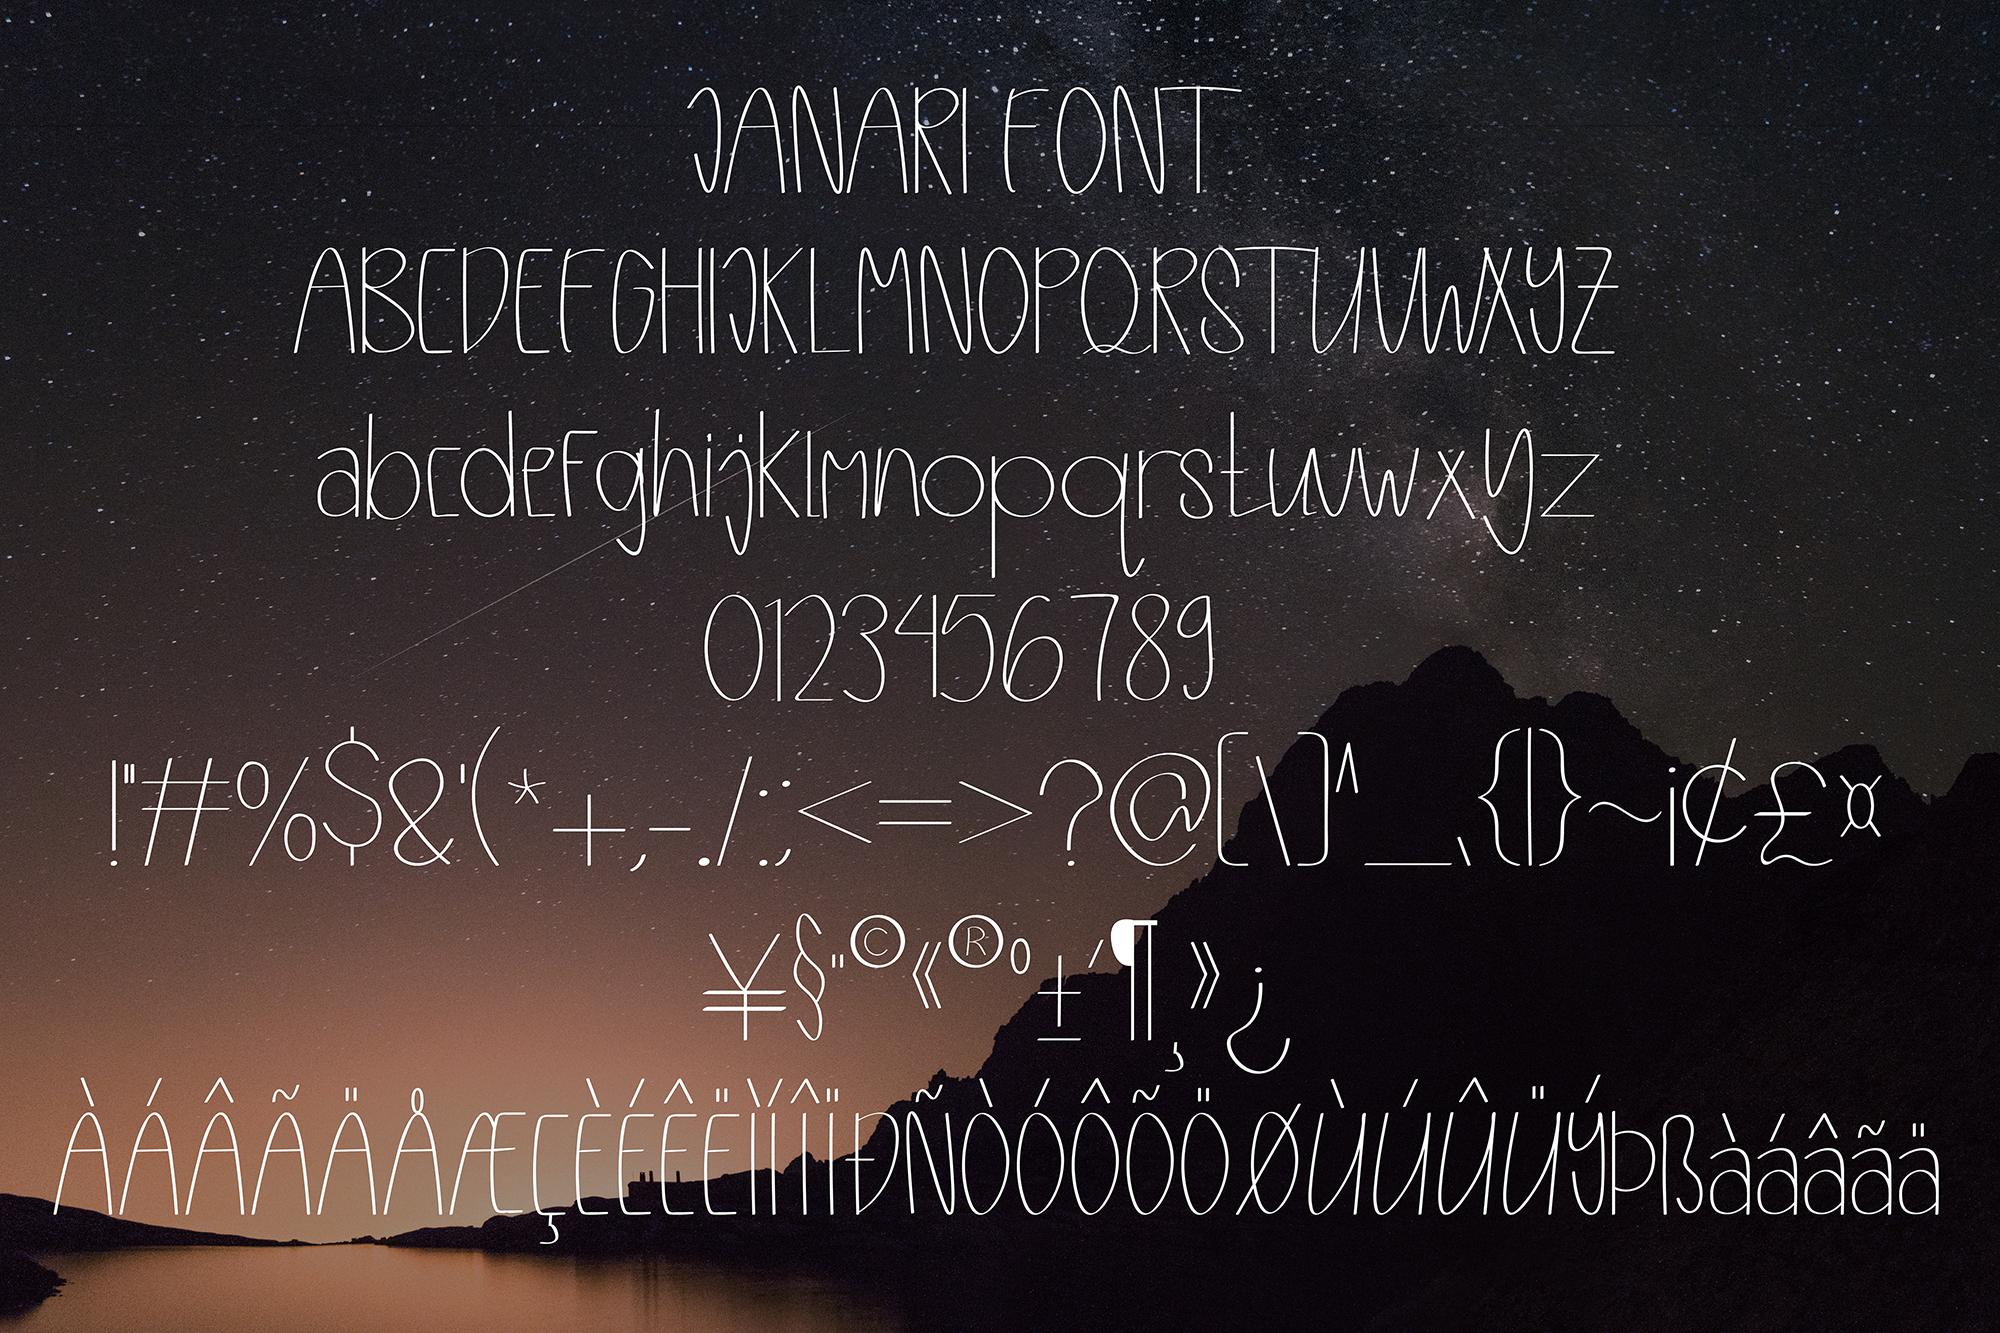 Janari font example image 2